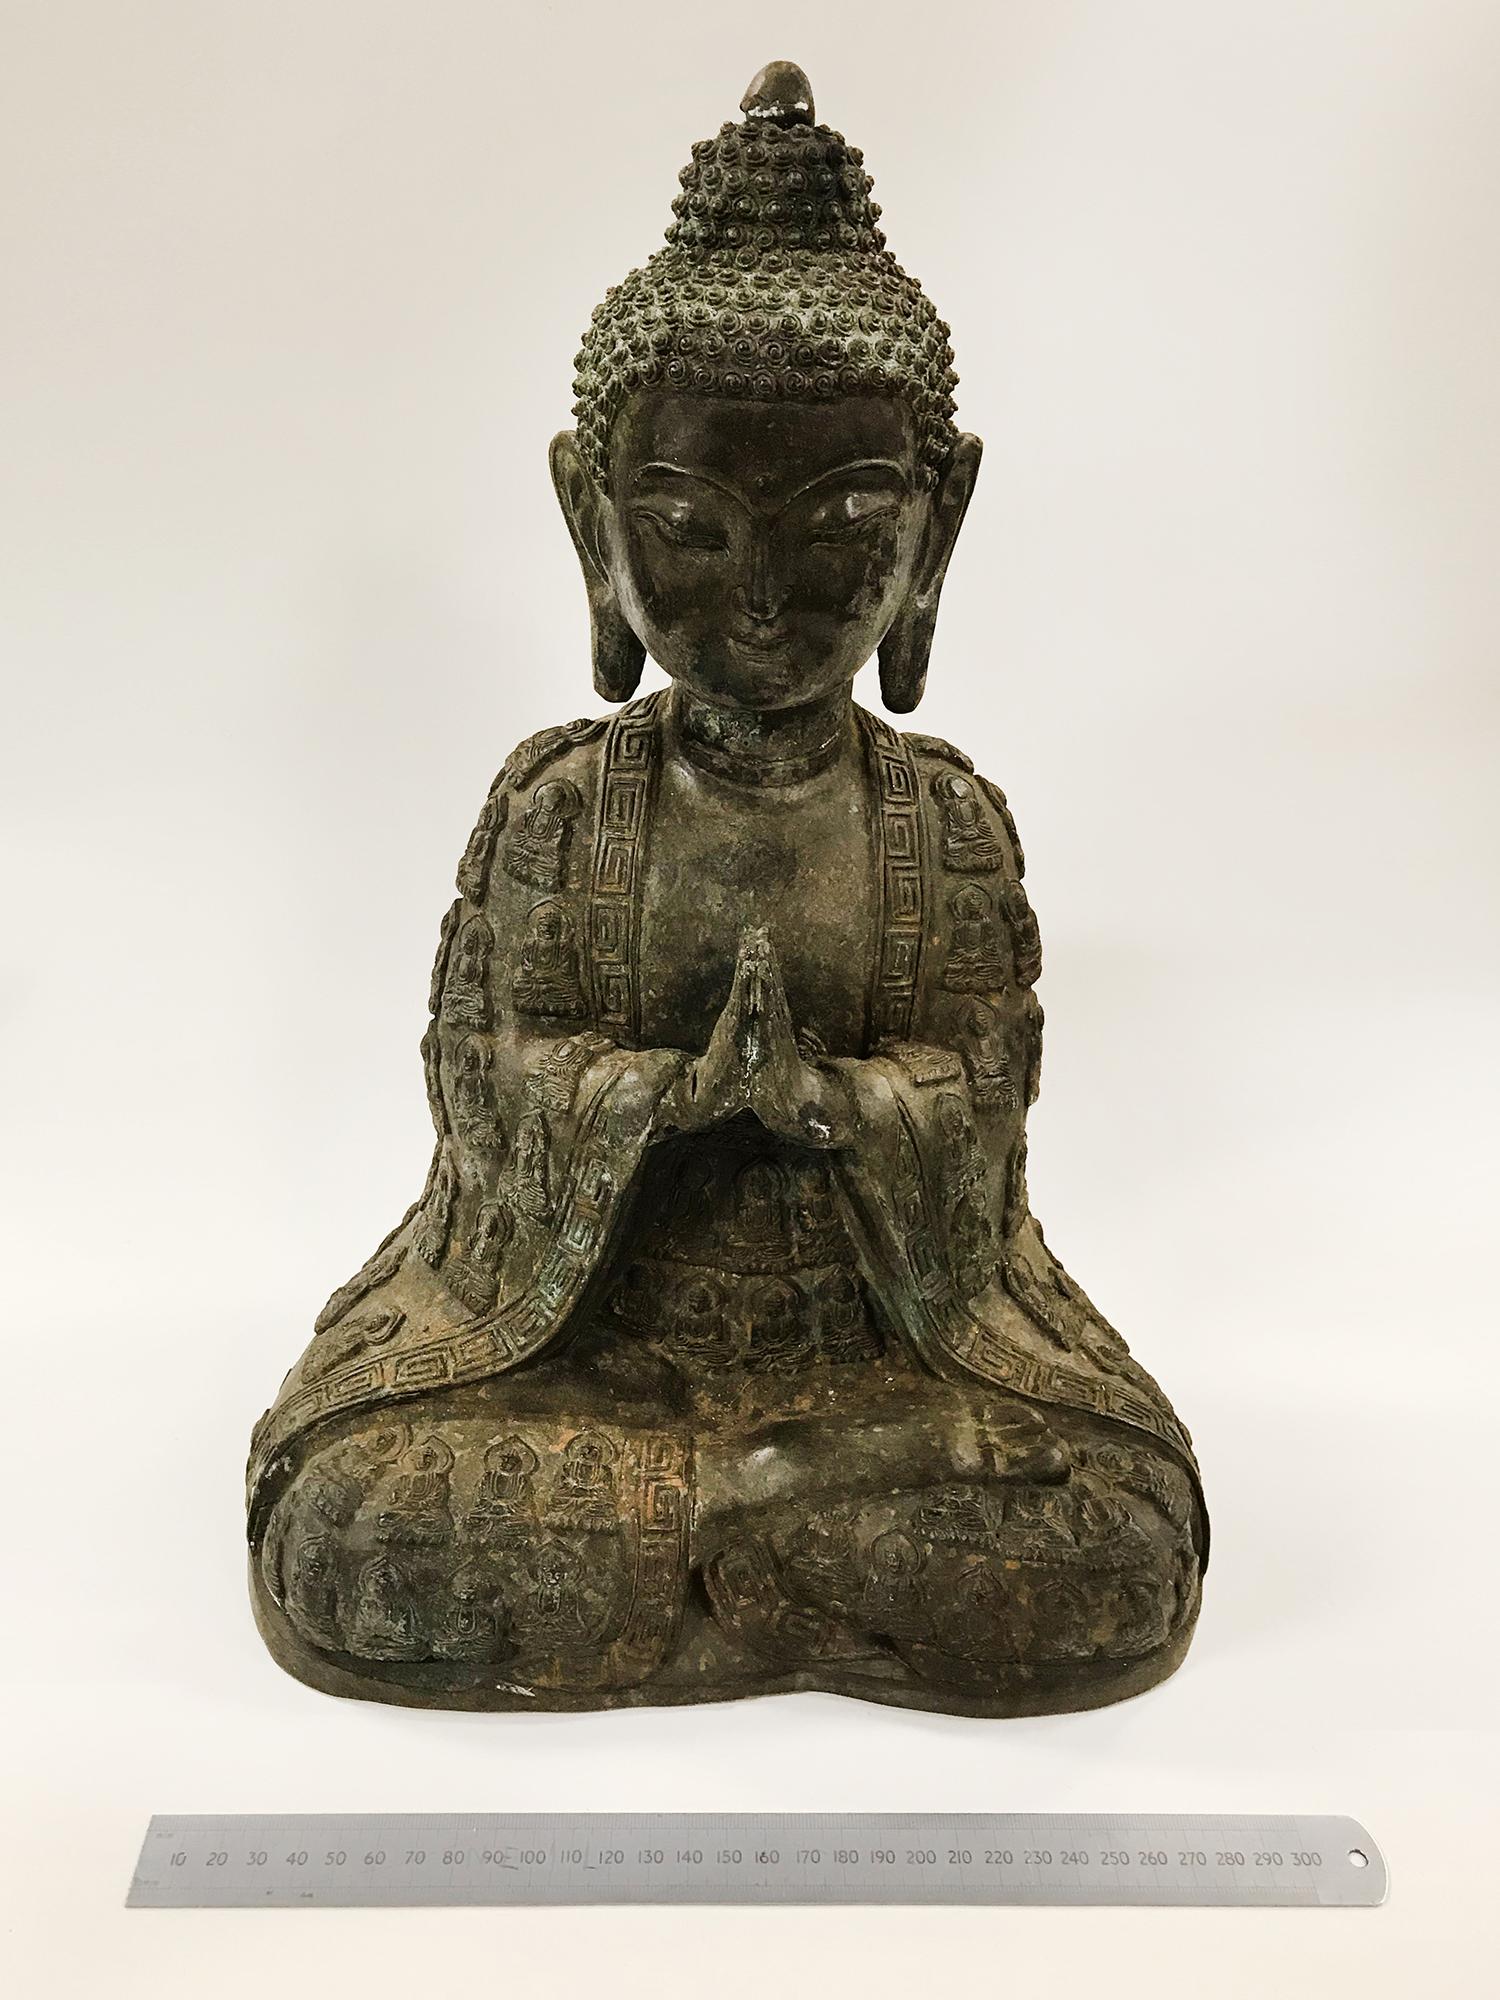 LARGE BRONZE SEATED BUDDHIST FIGURE - 40CM HIGH